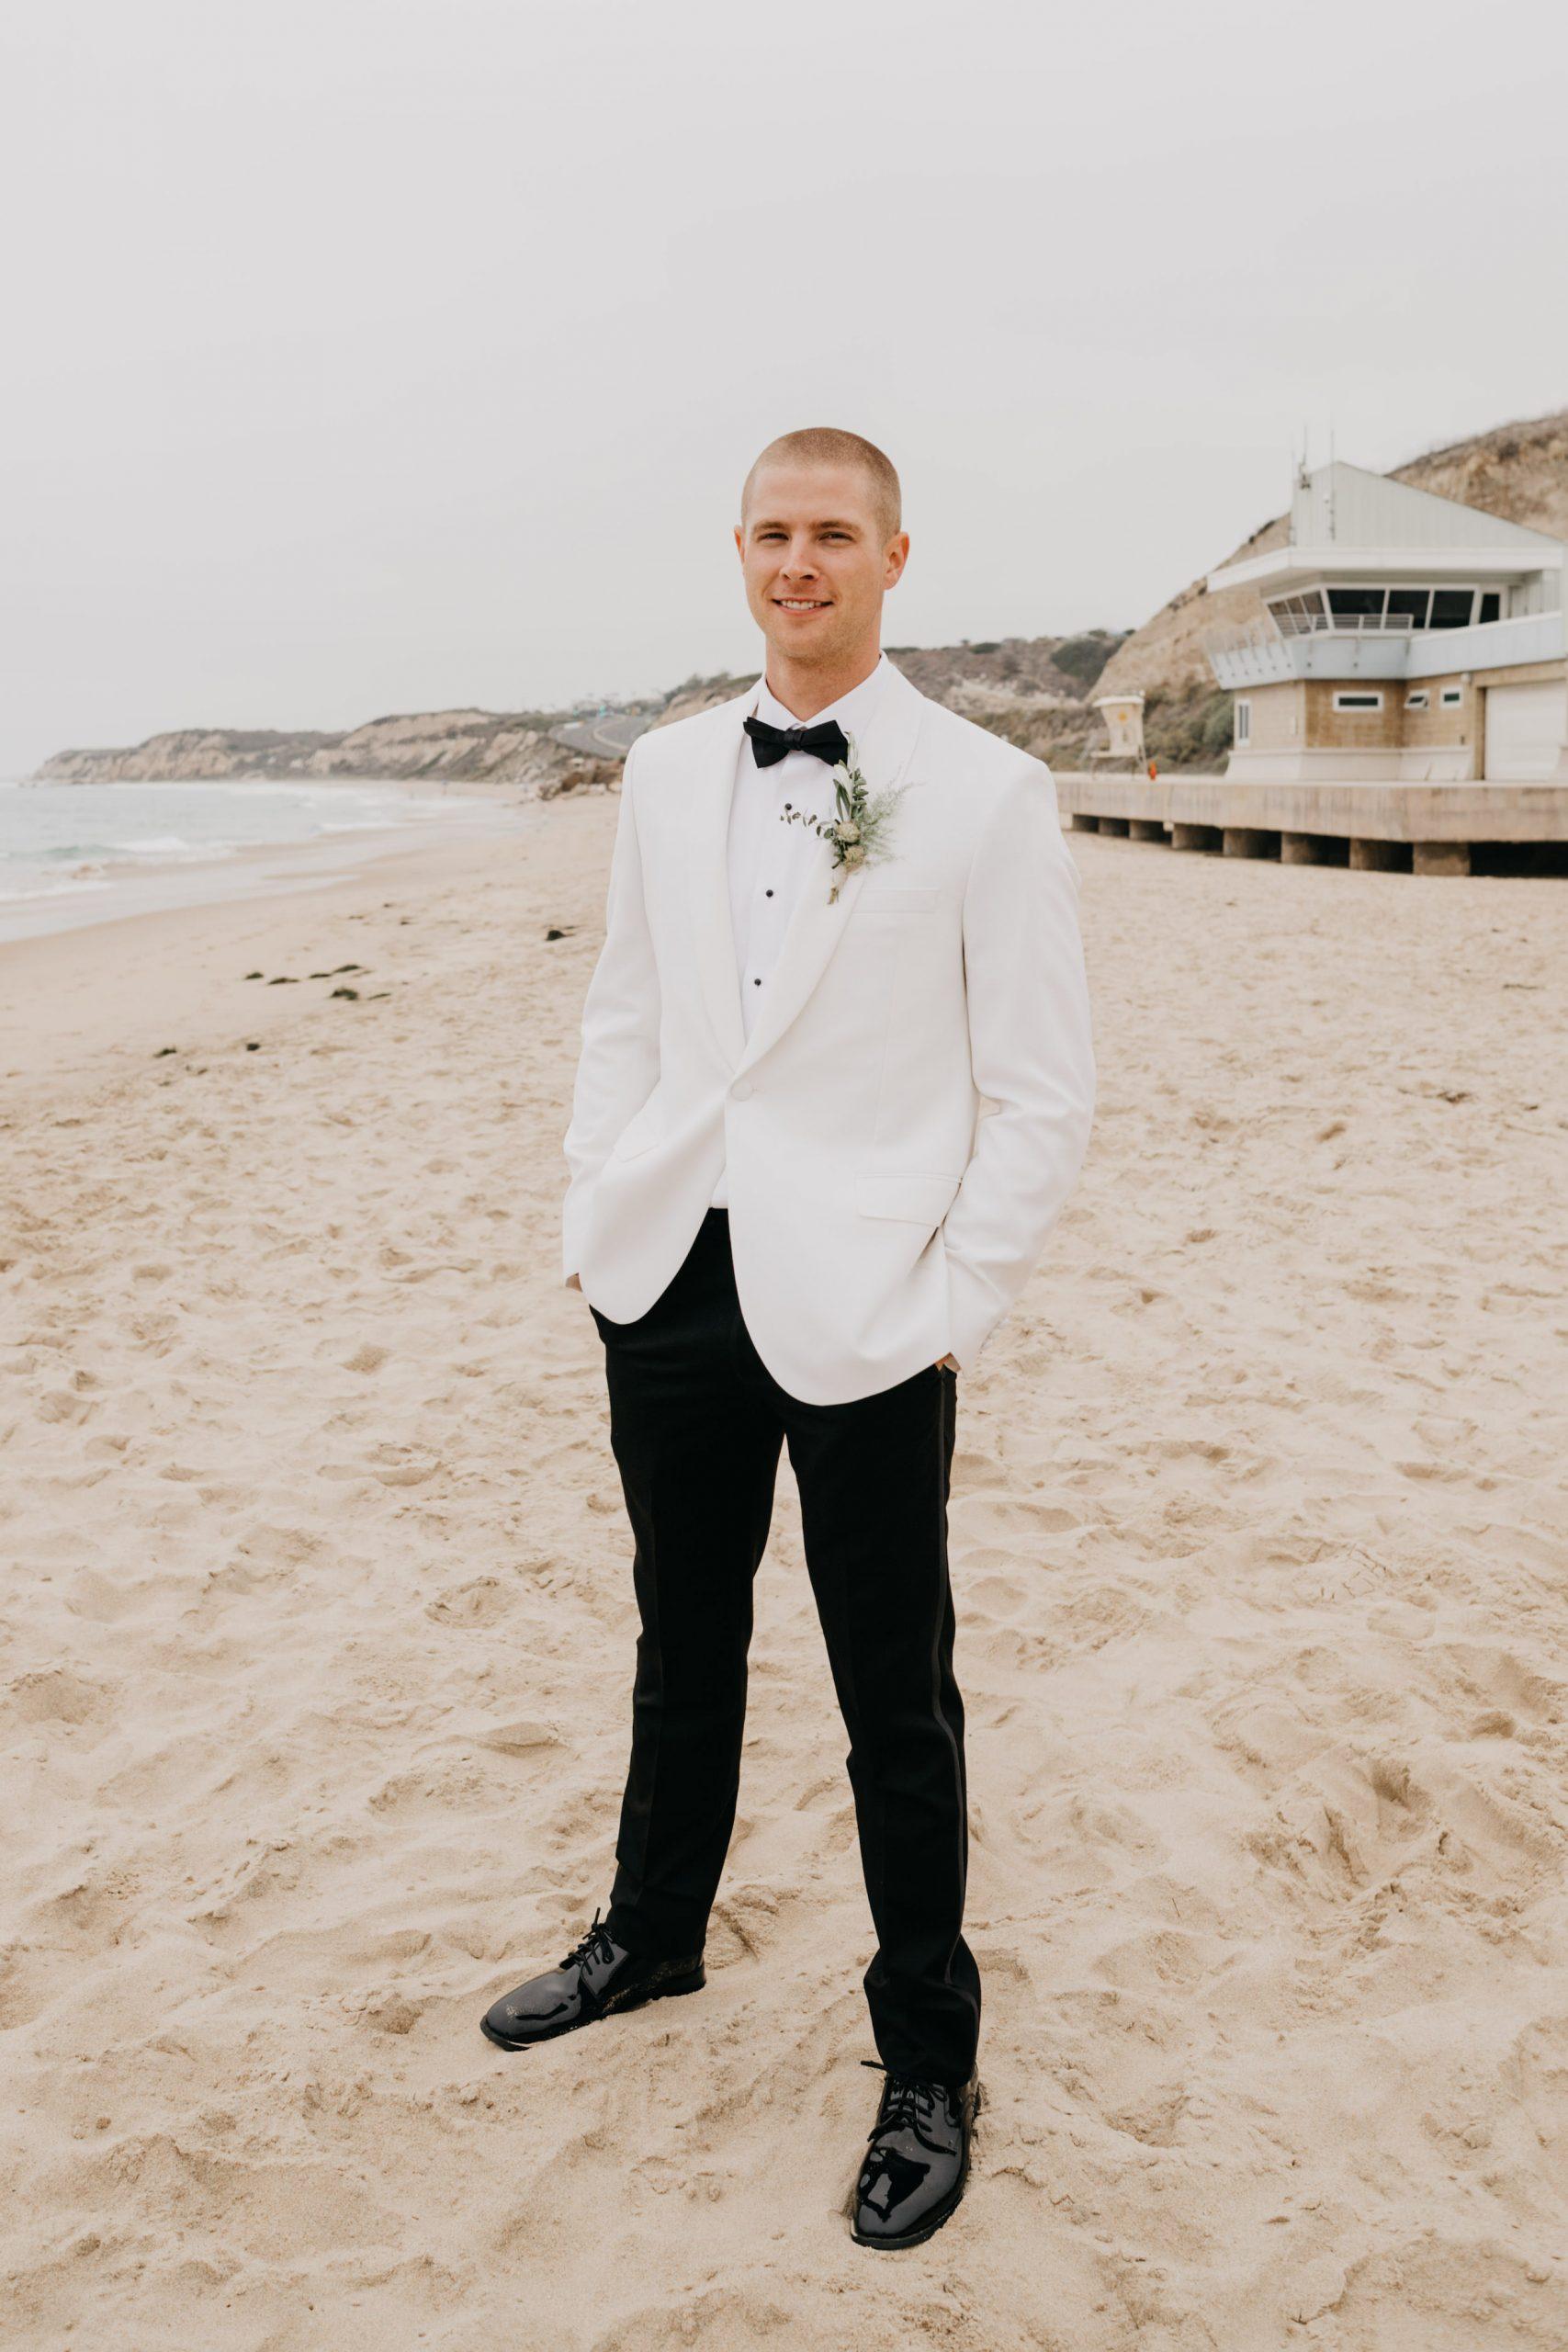 Crystal Cove State park Wedding in Laguna Beach, image by Fatima Elreda Photo